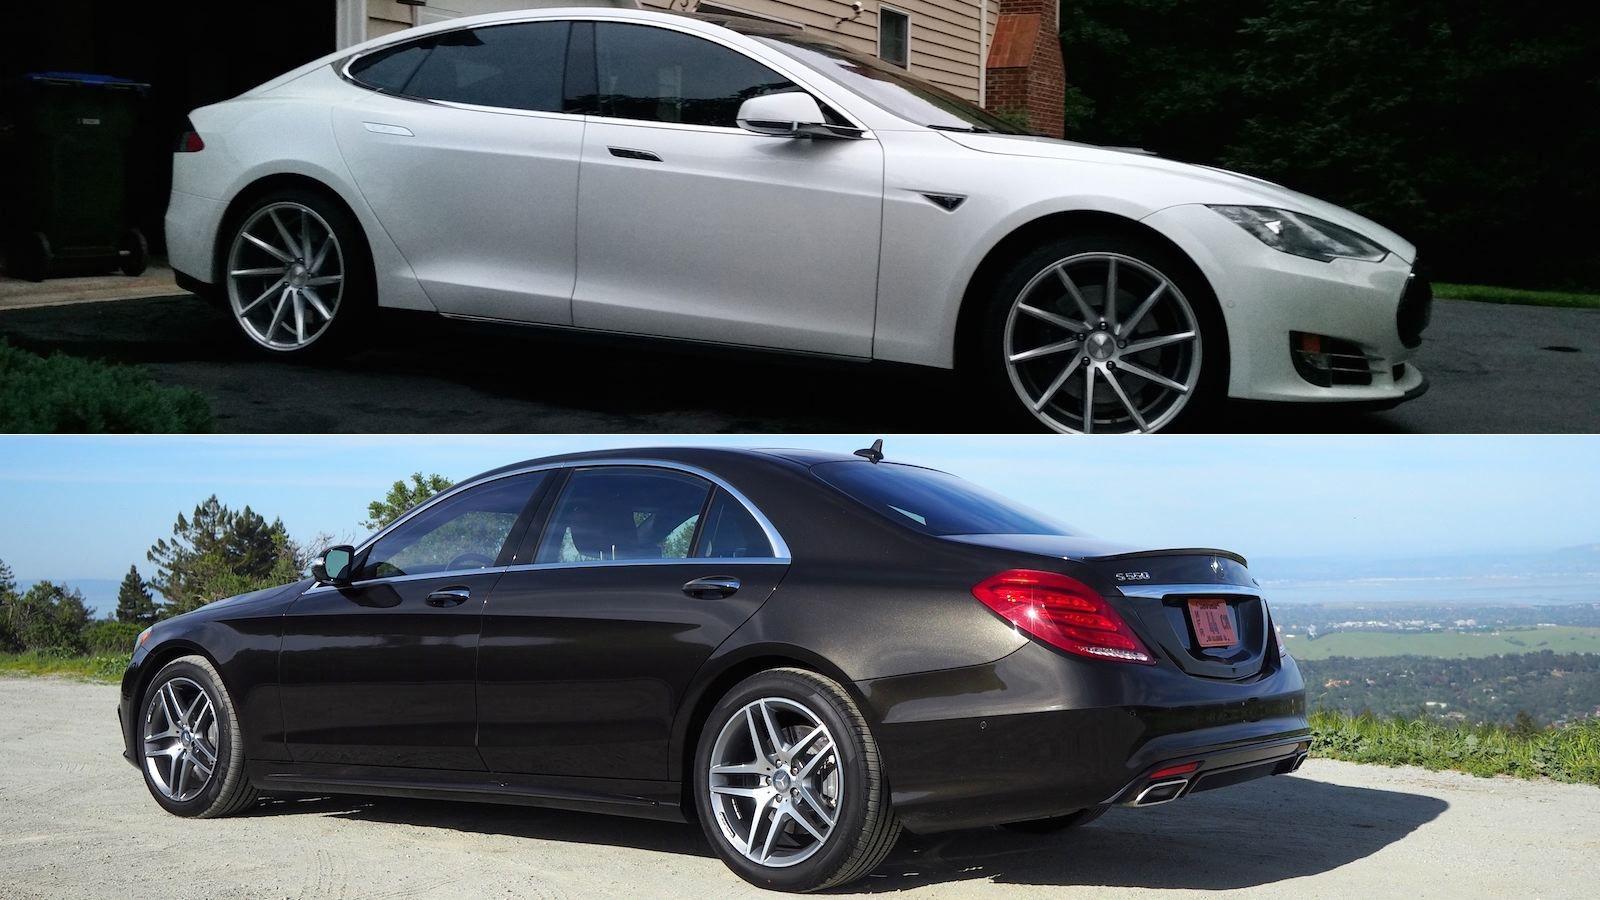 2014 Tesla S vs the 2014 Mercedes S550